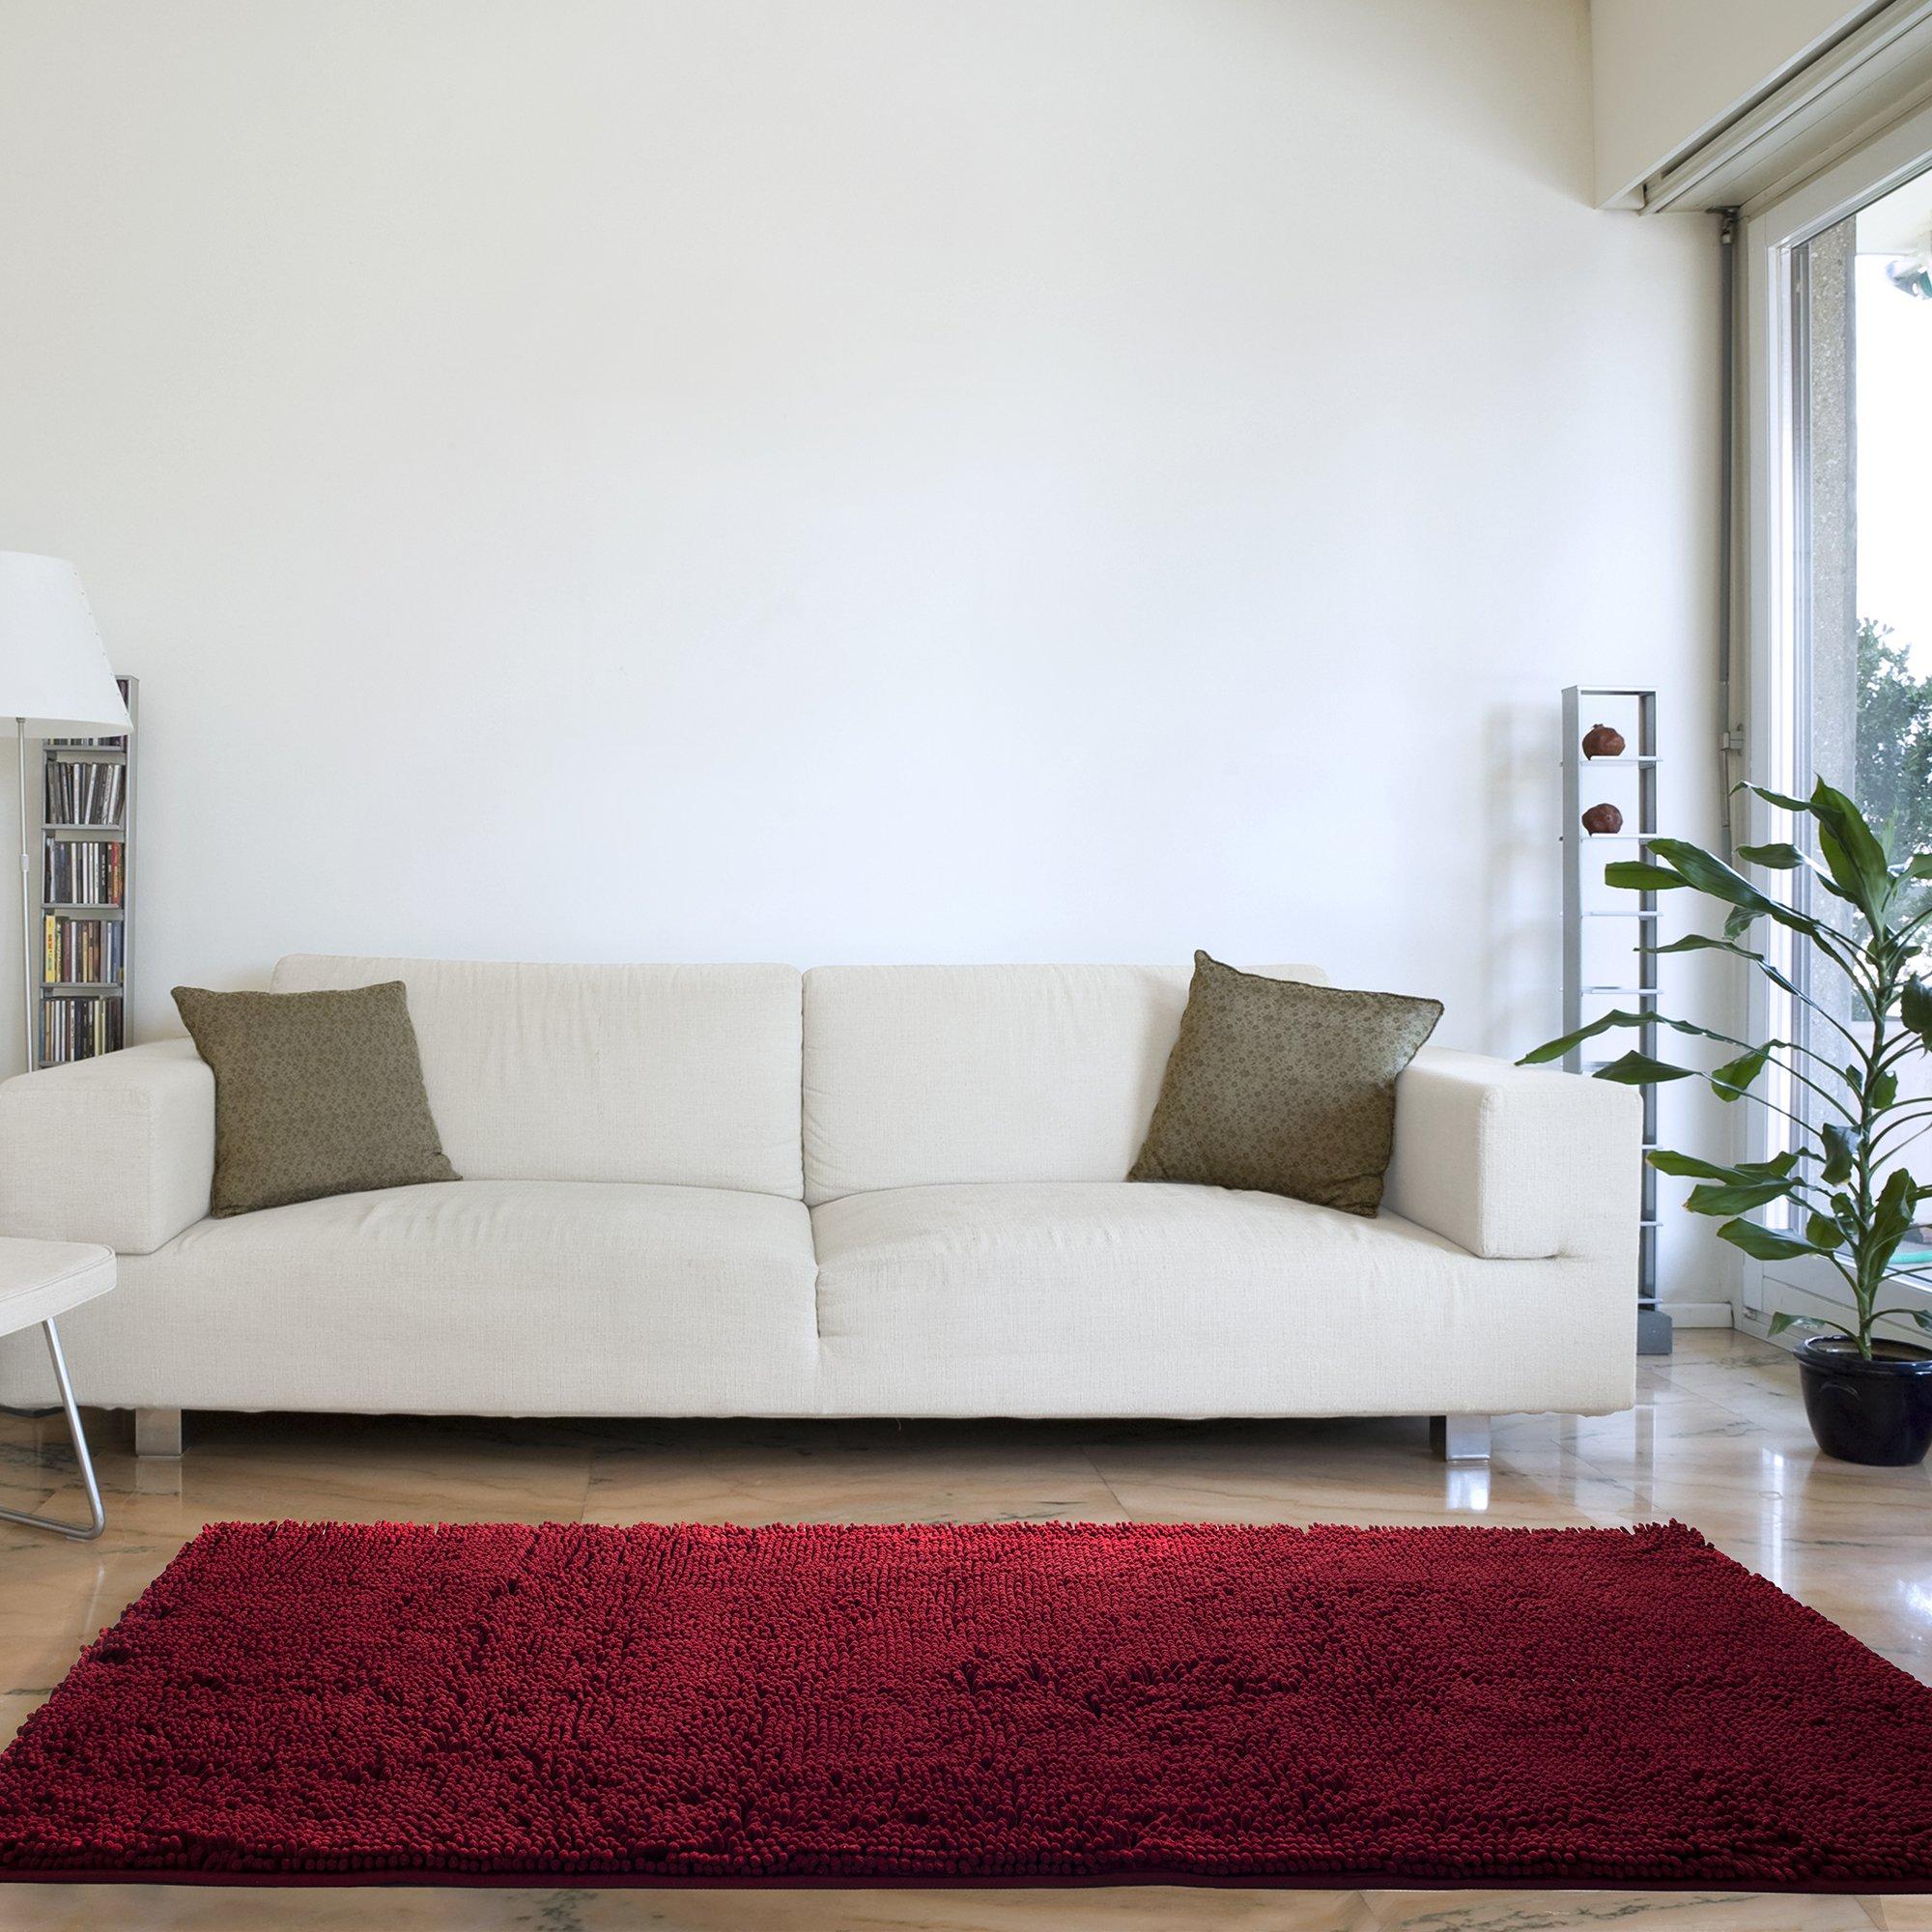 Bedford Home High Pile Shag Rug Carpet - Burgundy - 30x60